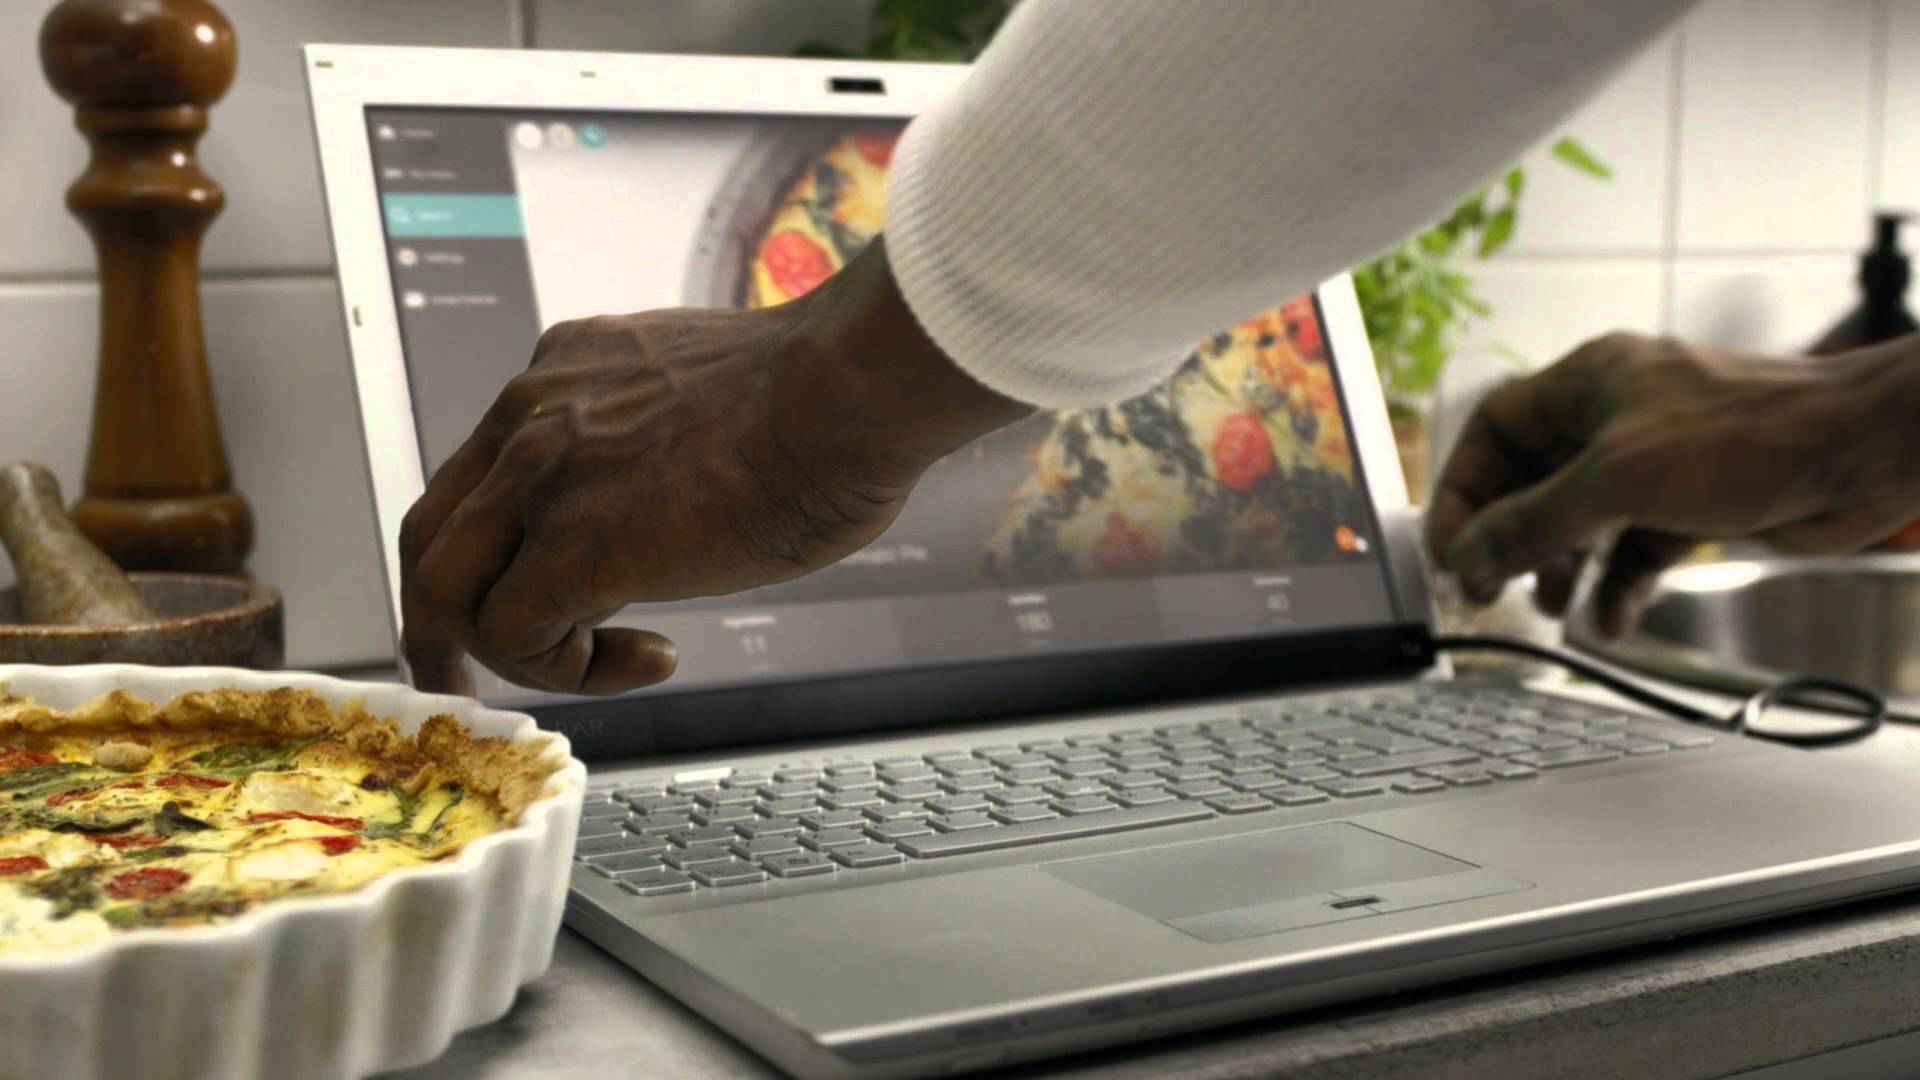 Airbar la barre usb qui rend votre cran tactile neozone for Visiere ecran ordinateur